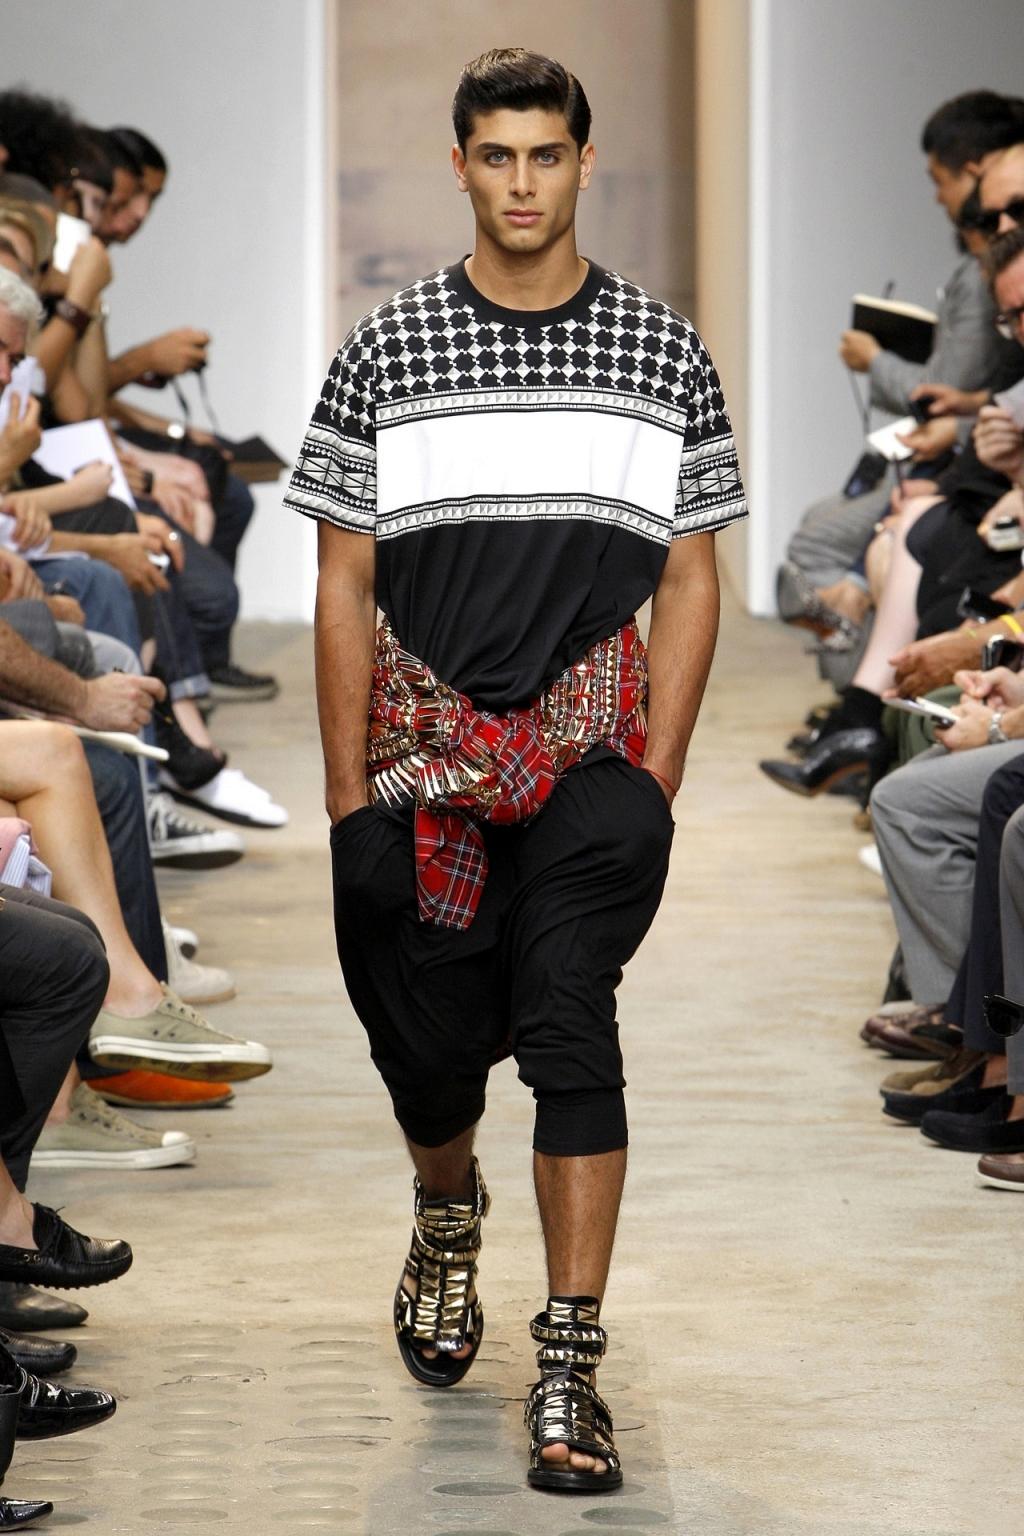 65bc60c013fd 1001 fashion trends  Gladiator sandals for men